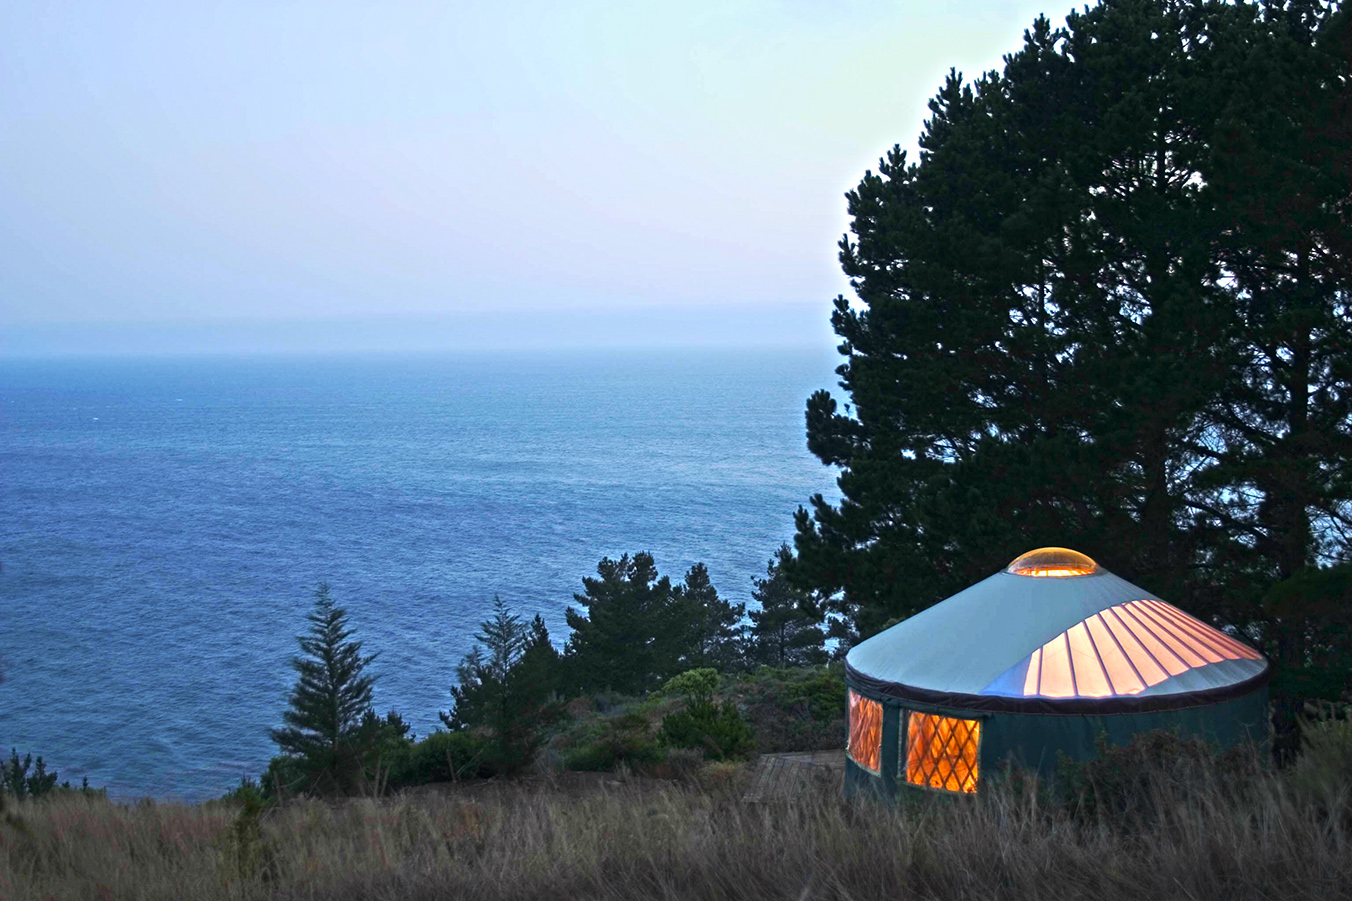 Pacific-Yurts-Ocean-View.jpg